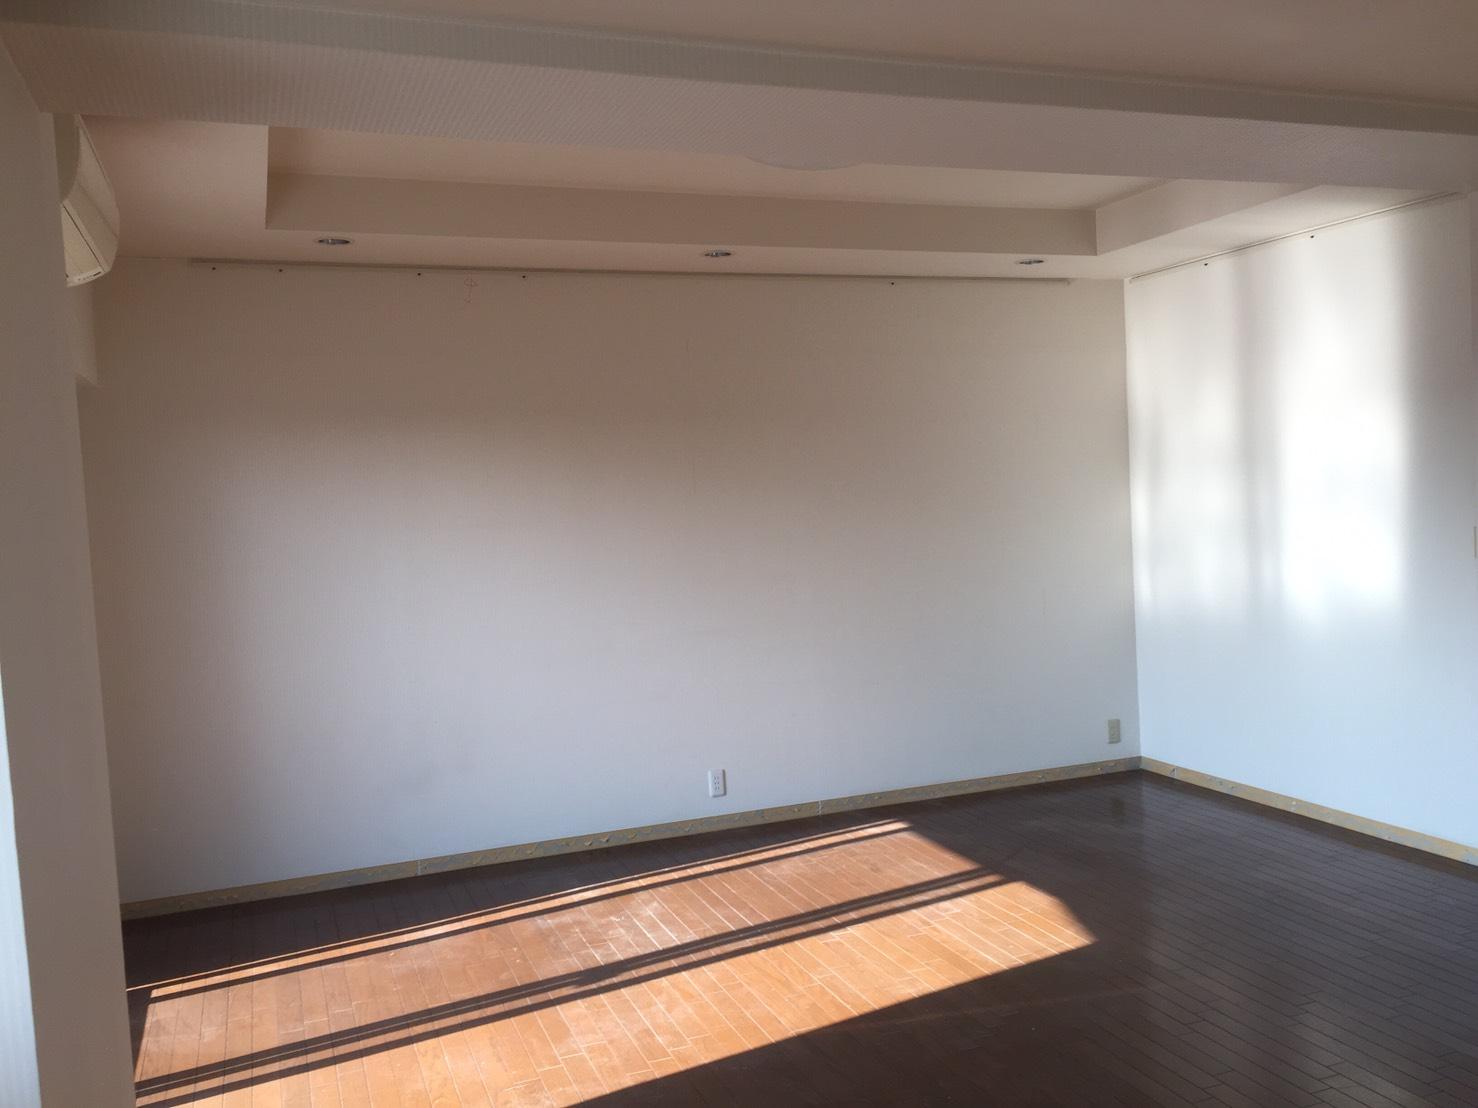 【 Before 03 】 リフォーム前のリビング 《 Asia Home 施工事例001 横浜市中区 3LDKマンション 》